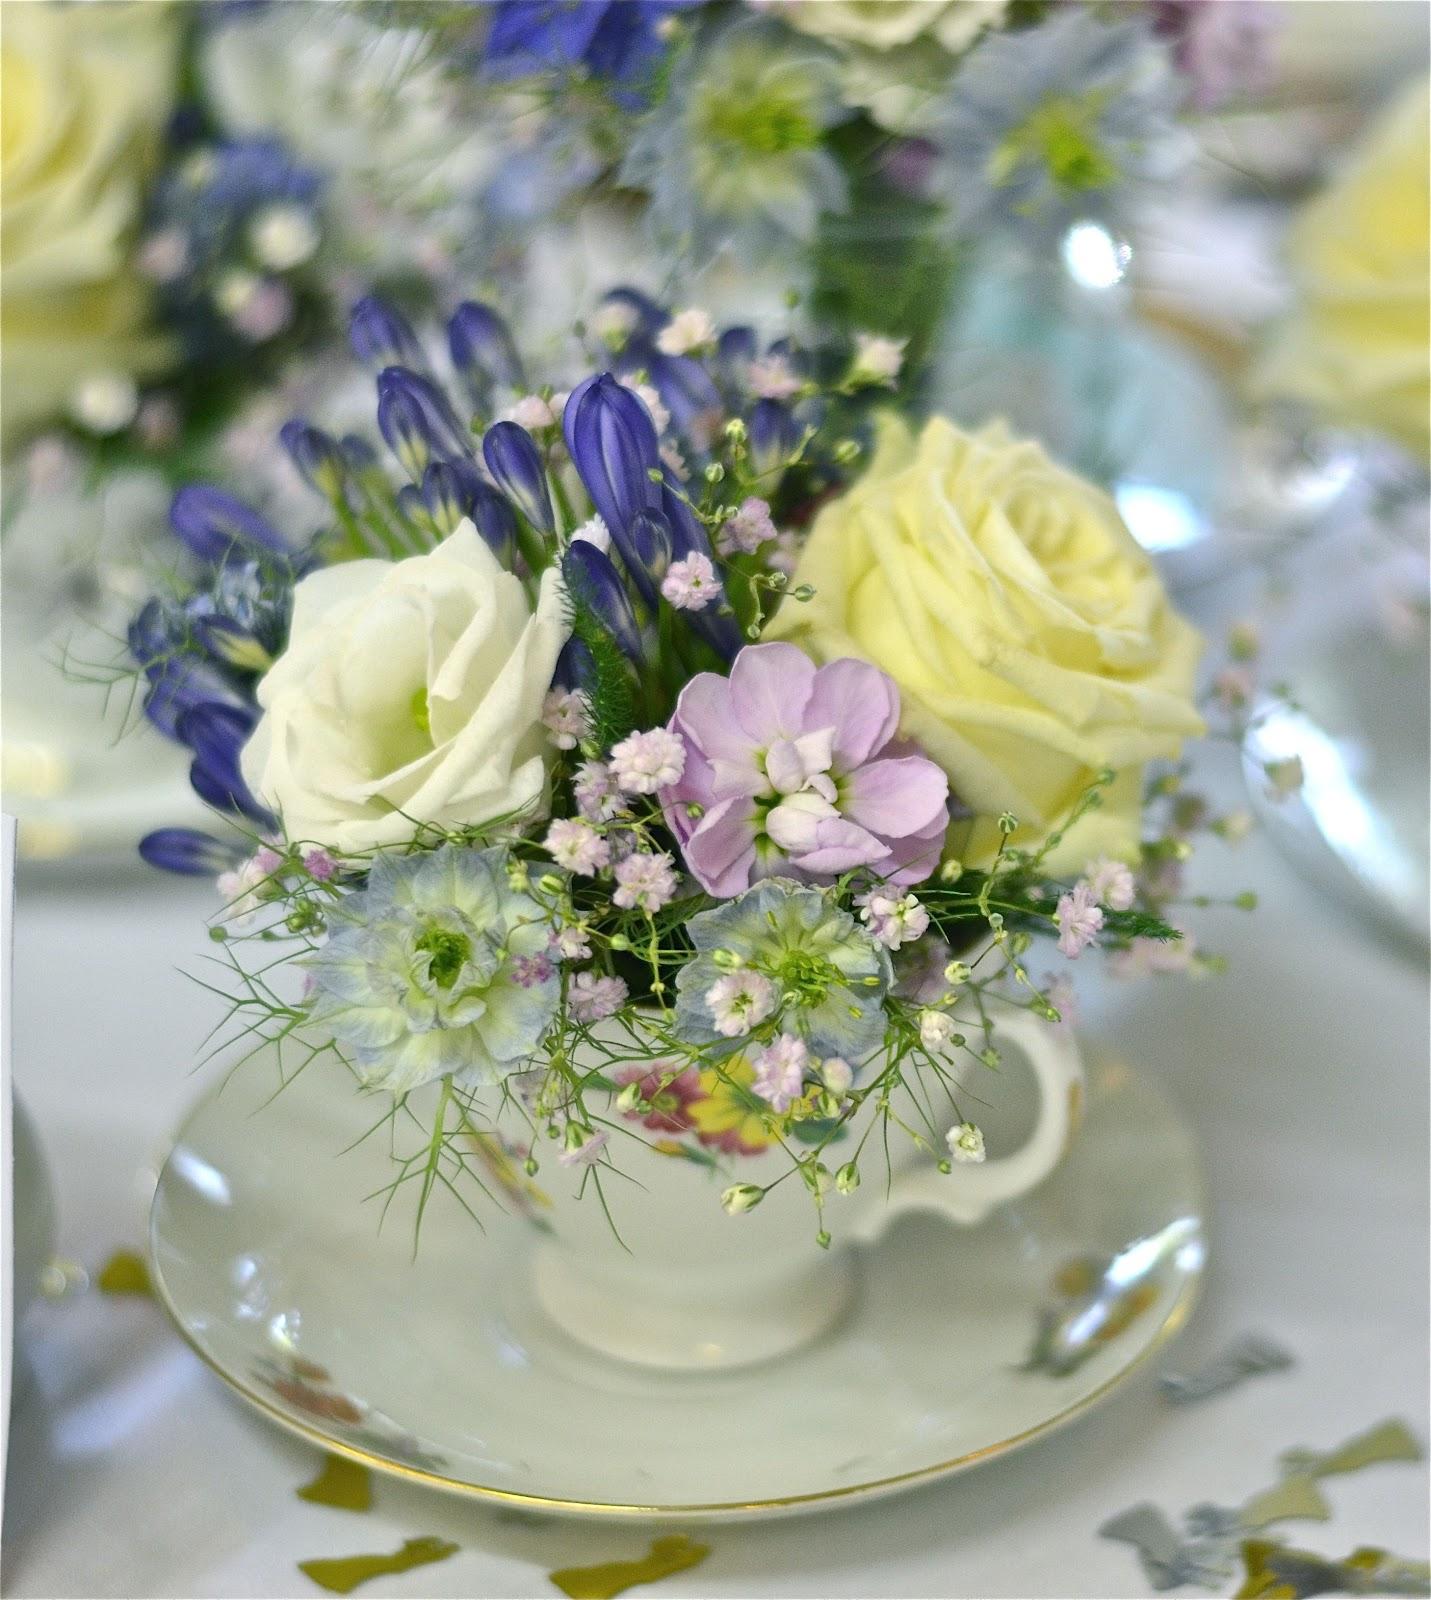 Vintage Flower Arrangements For Wedding: Wedding Flowers Blog: Laura's Vintage, English Country